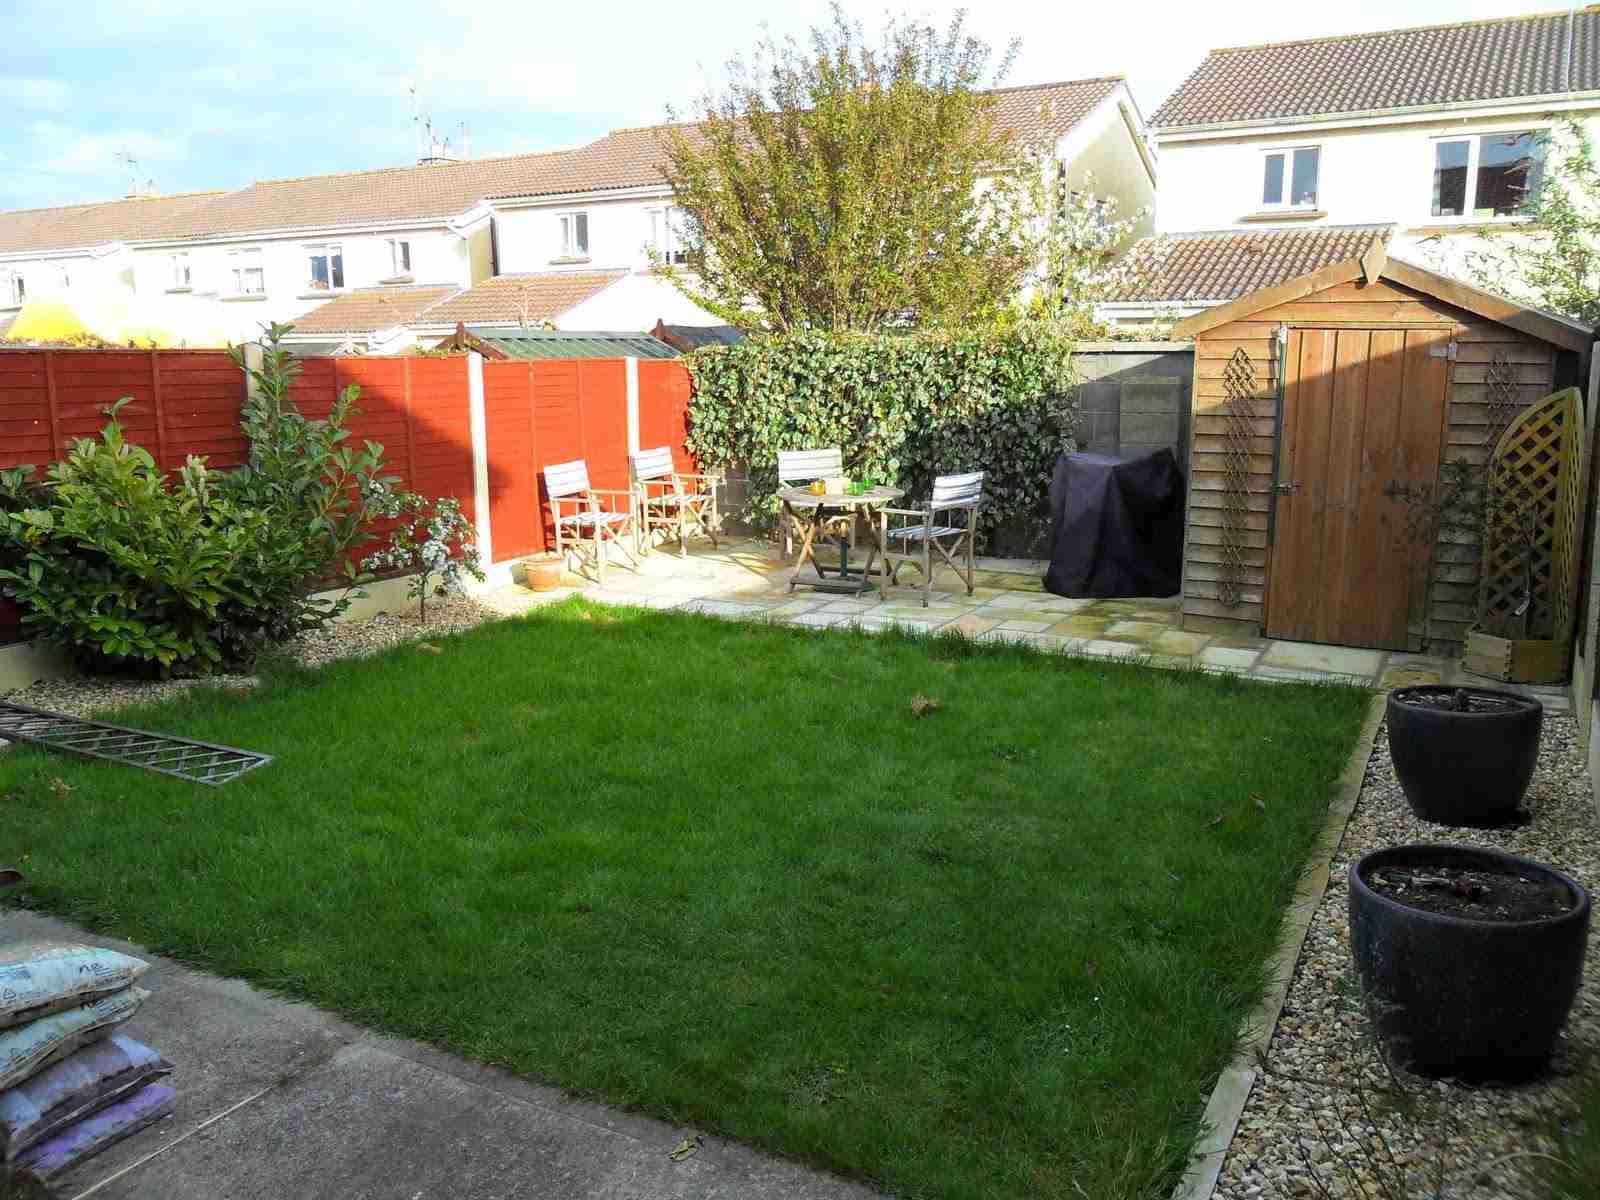 Landscaping A Rear Garden Design Makeover U0026 Decking, Inse Bay, Laytown,  Co.Meath